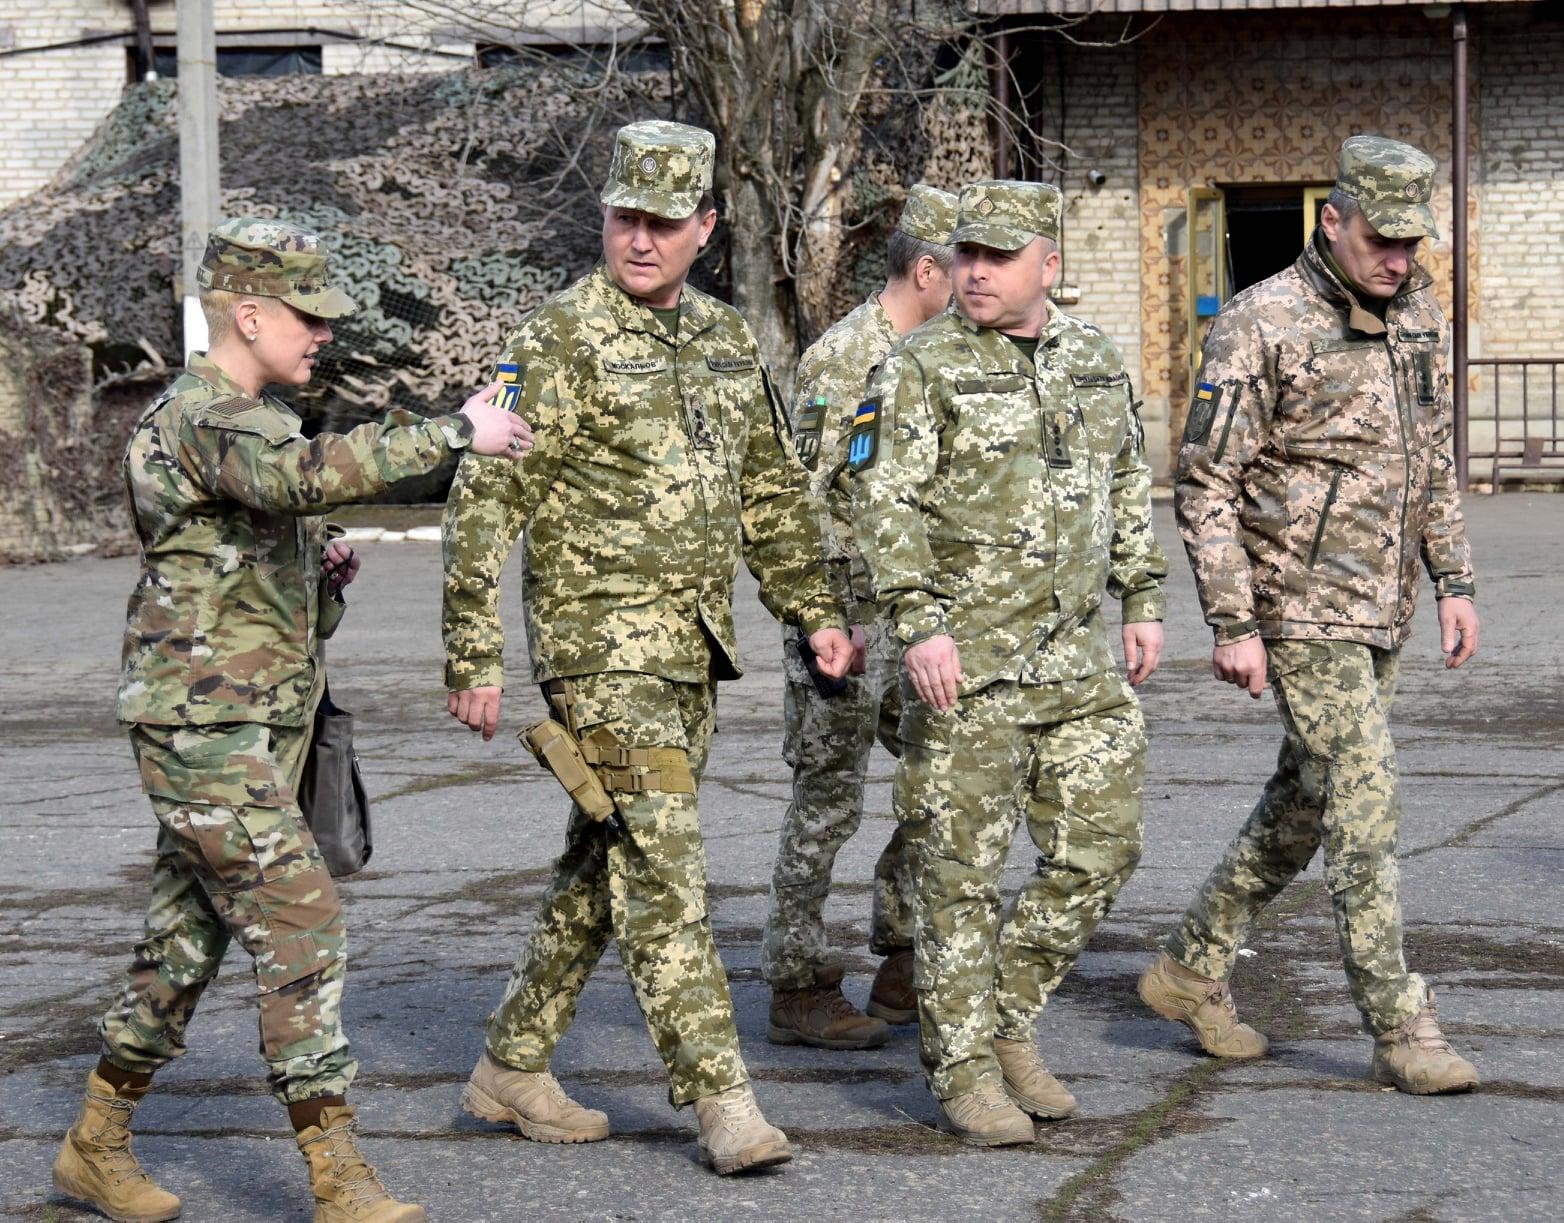 Фото © Facebook / Операція об'єднаних сил / Joint Forces Operation